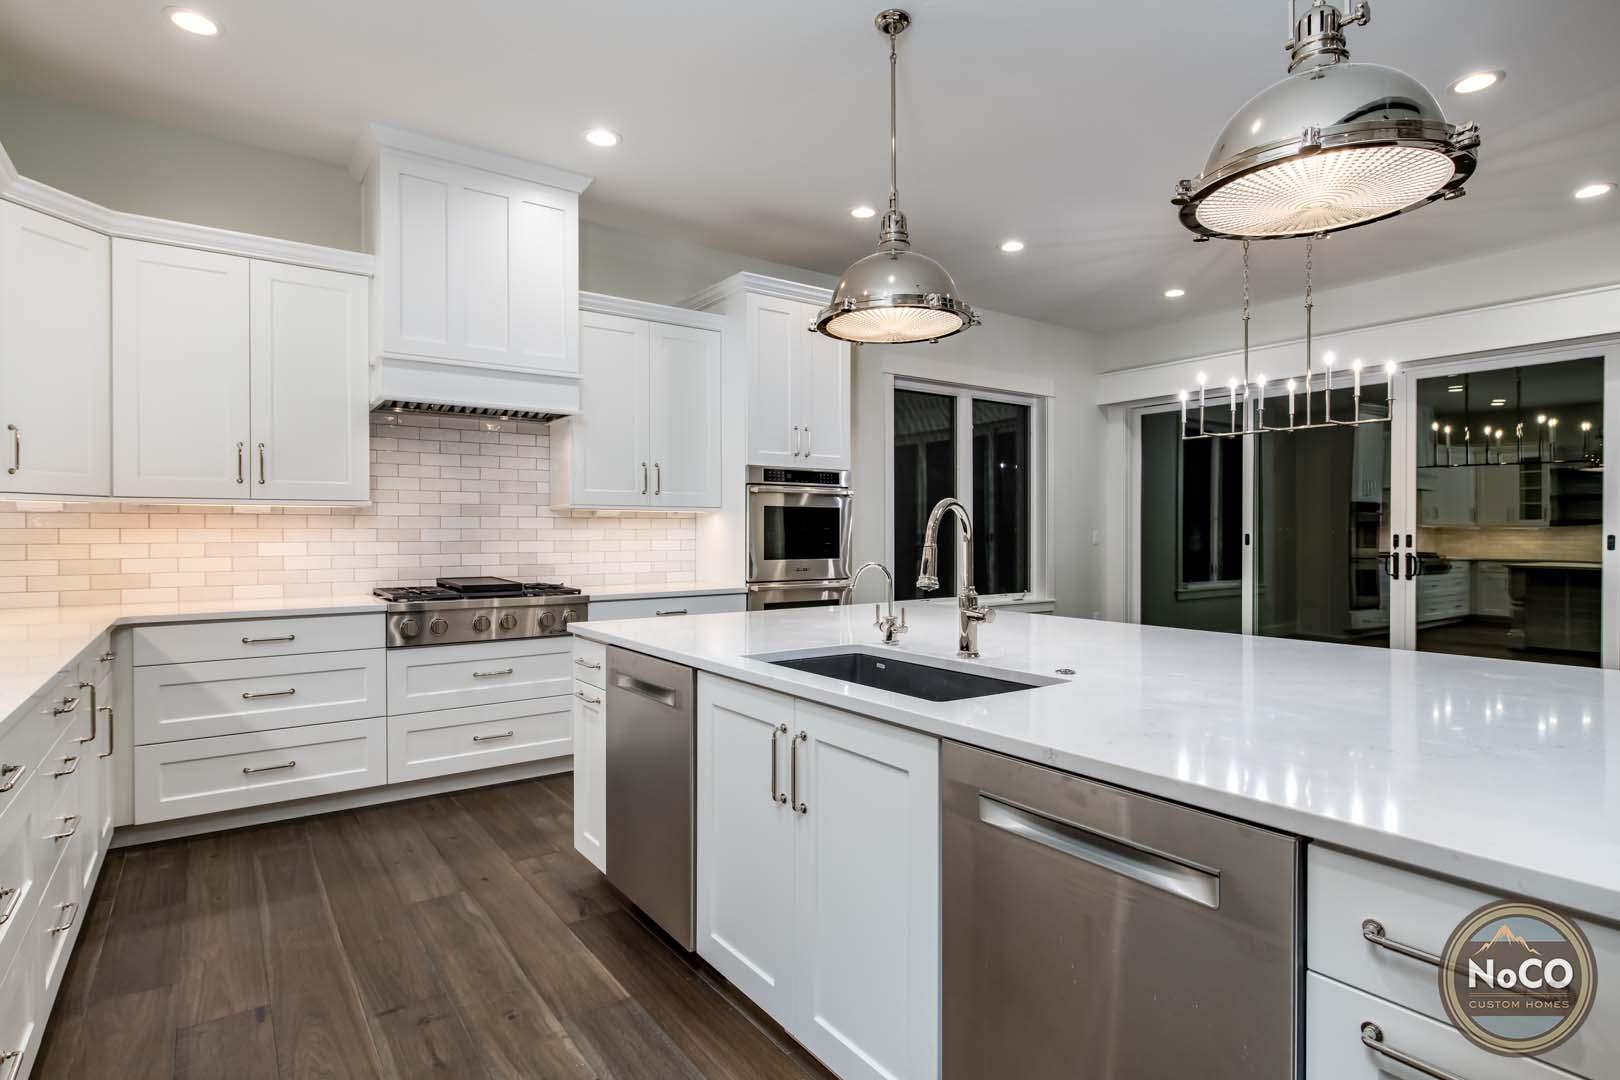 colorado custom home kitchen stainless steel appliances